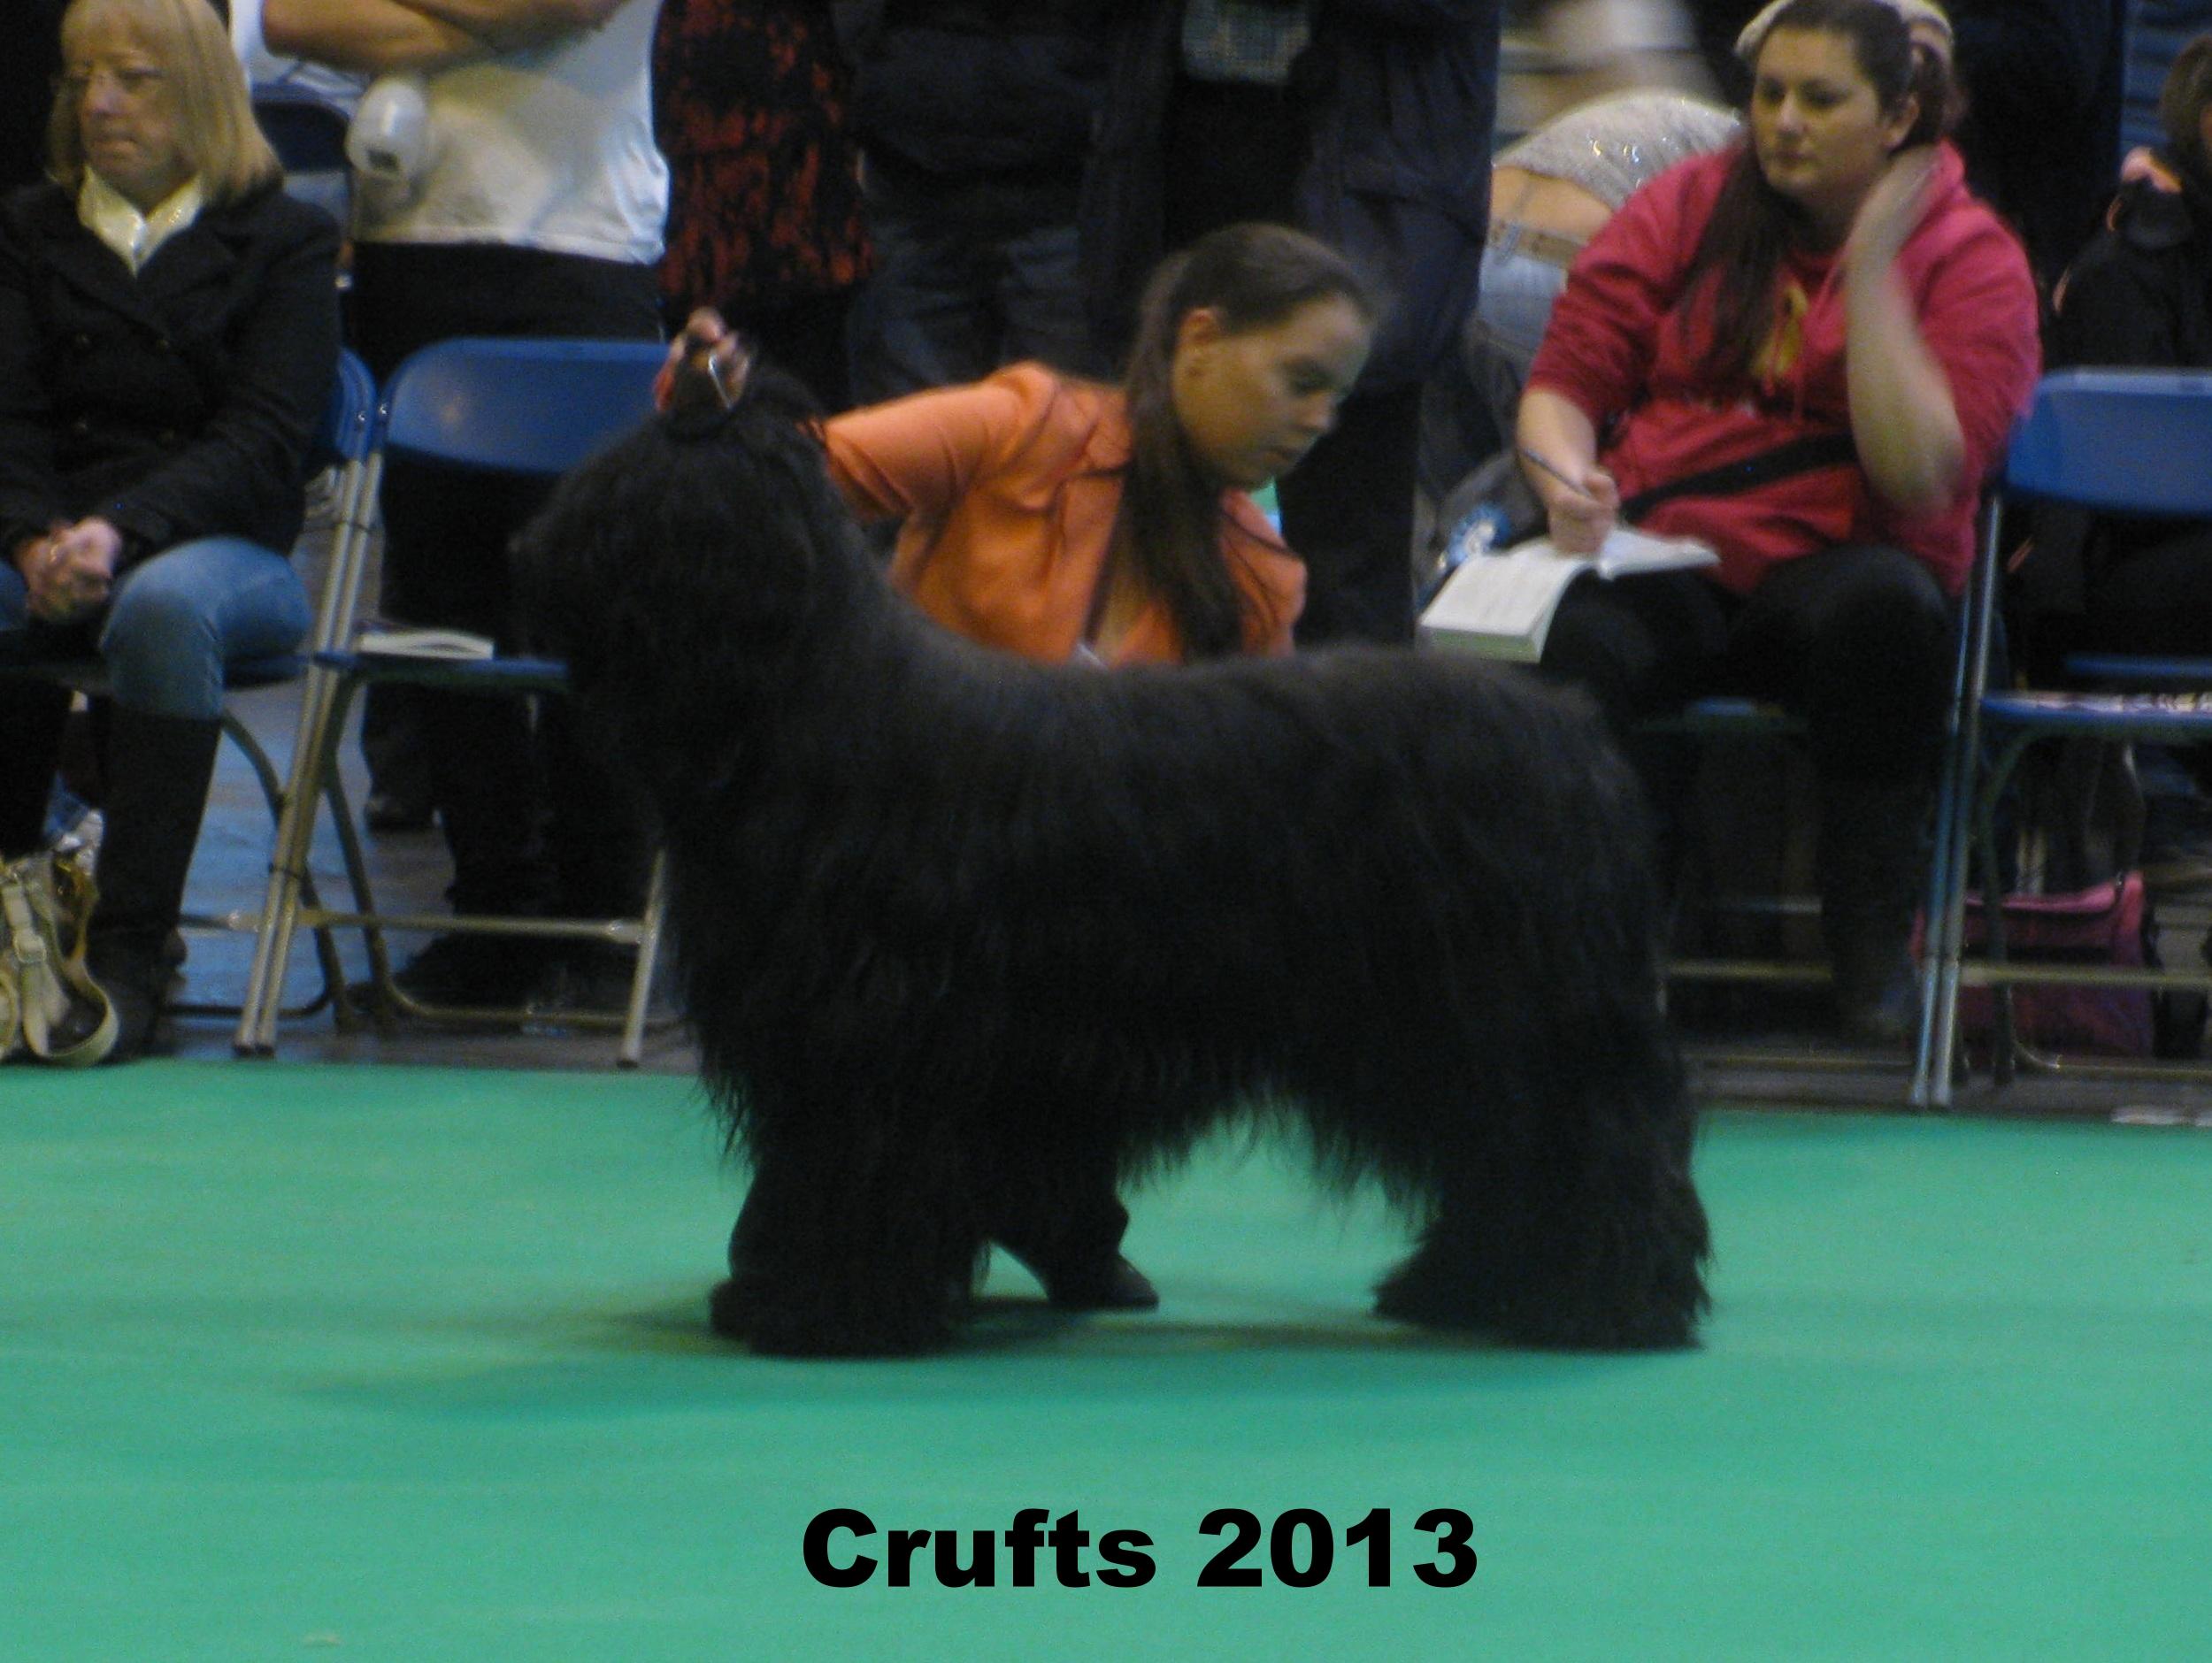 Mitch Crufts 2012.JPG